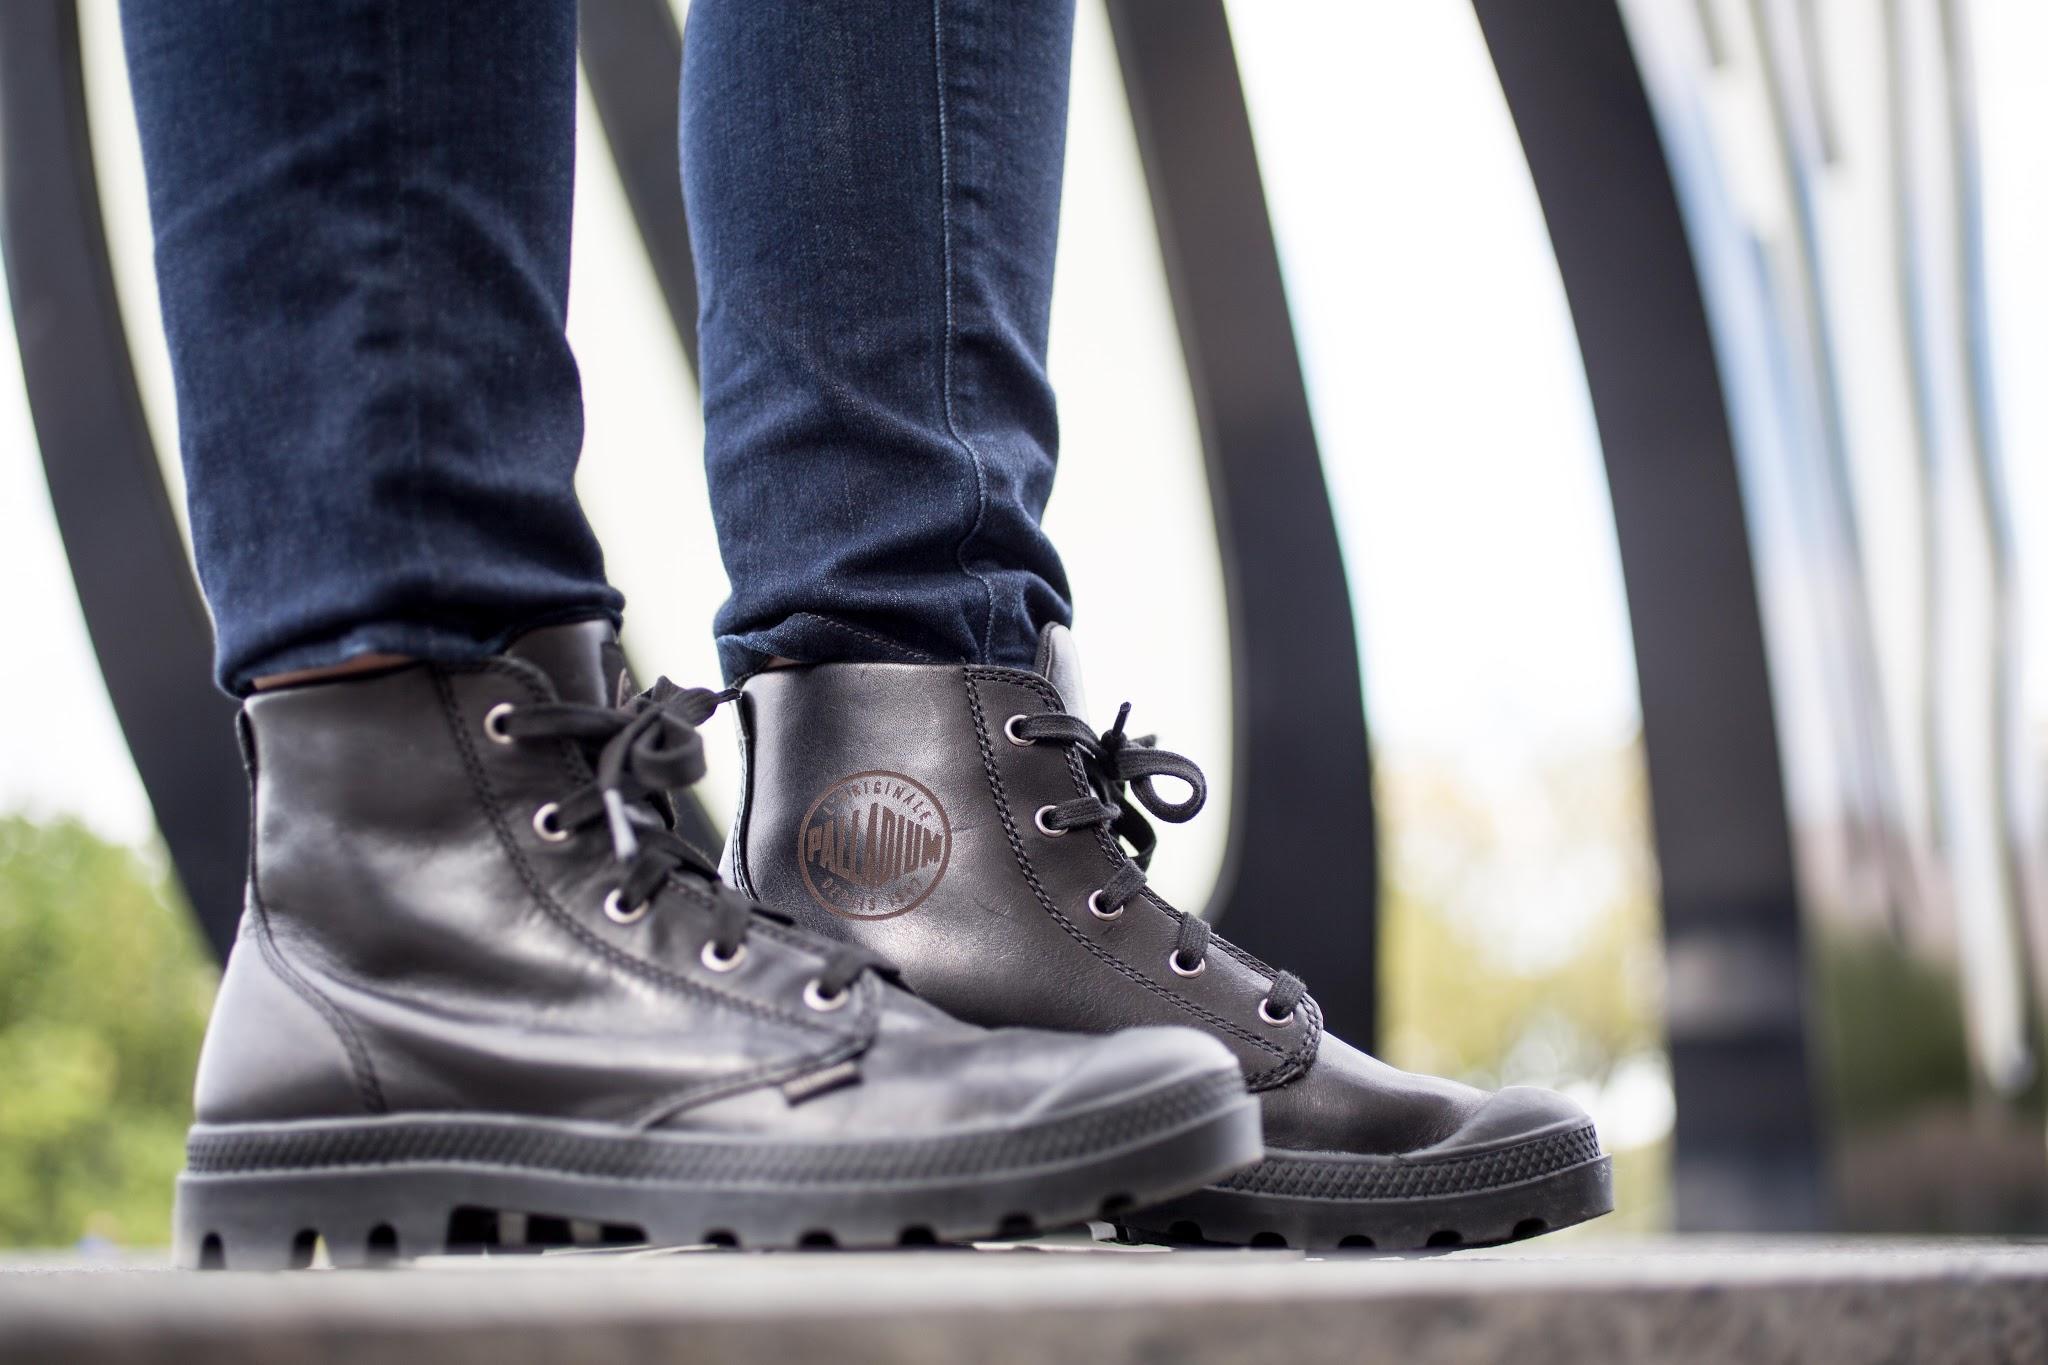 Palladium Boots for Women